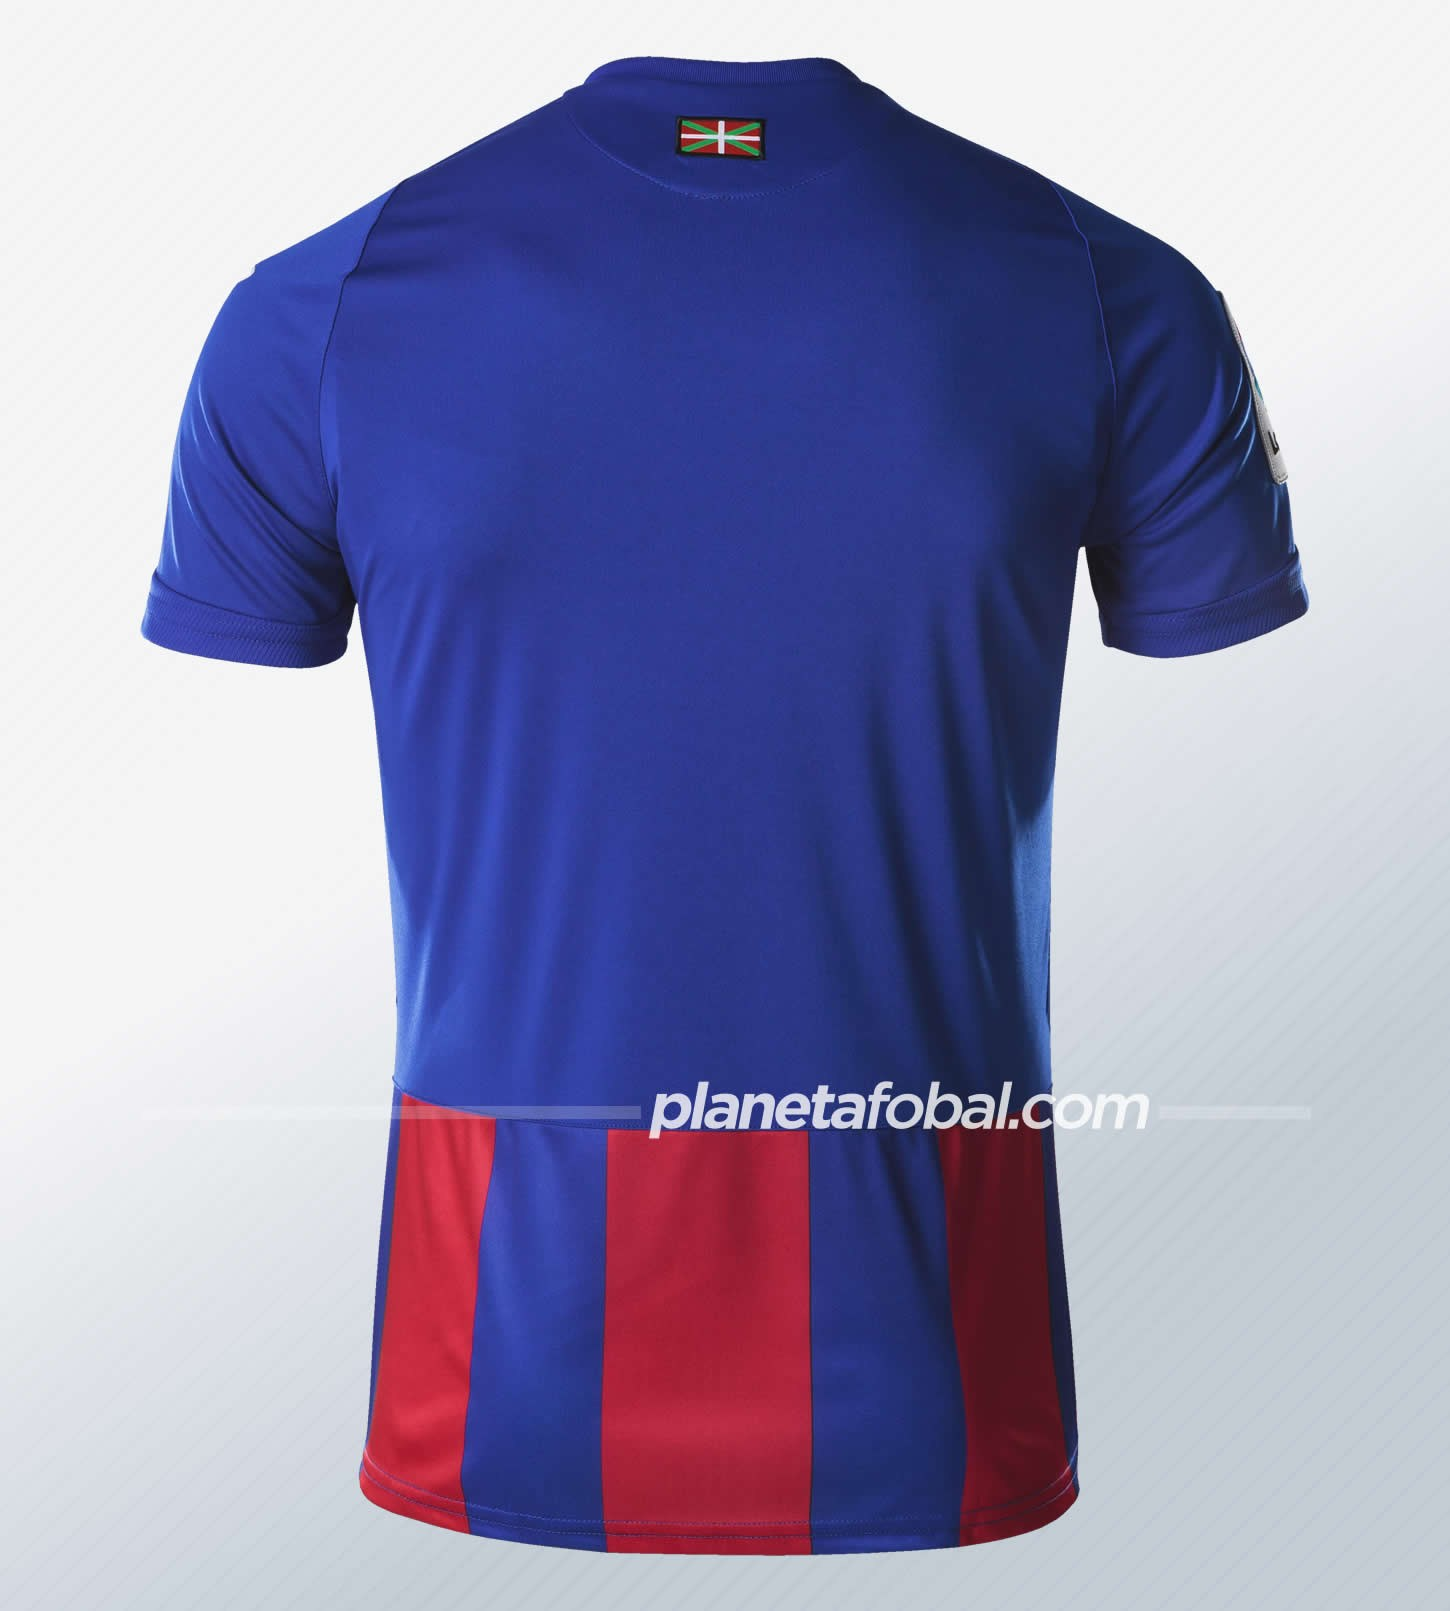 Camiseta Joma del SD Eibar 2020/21 | Imagen Web Oficial